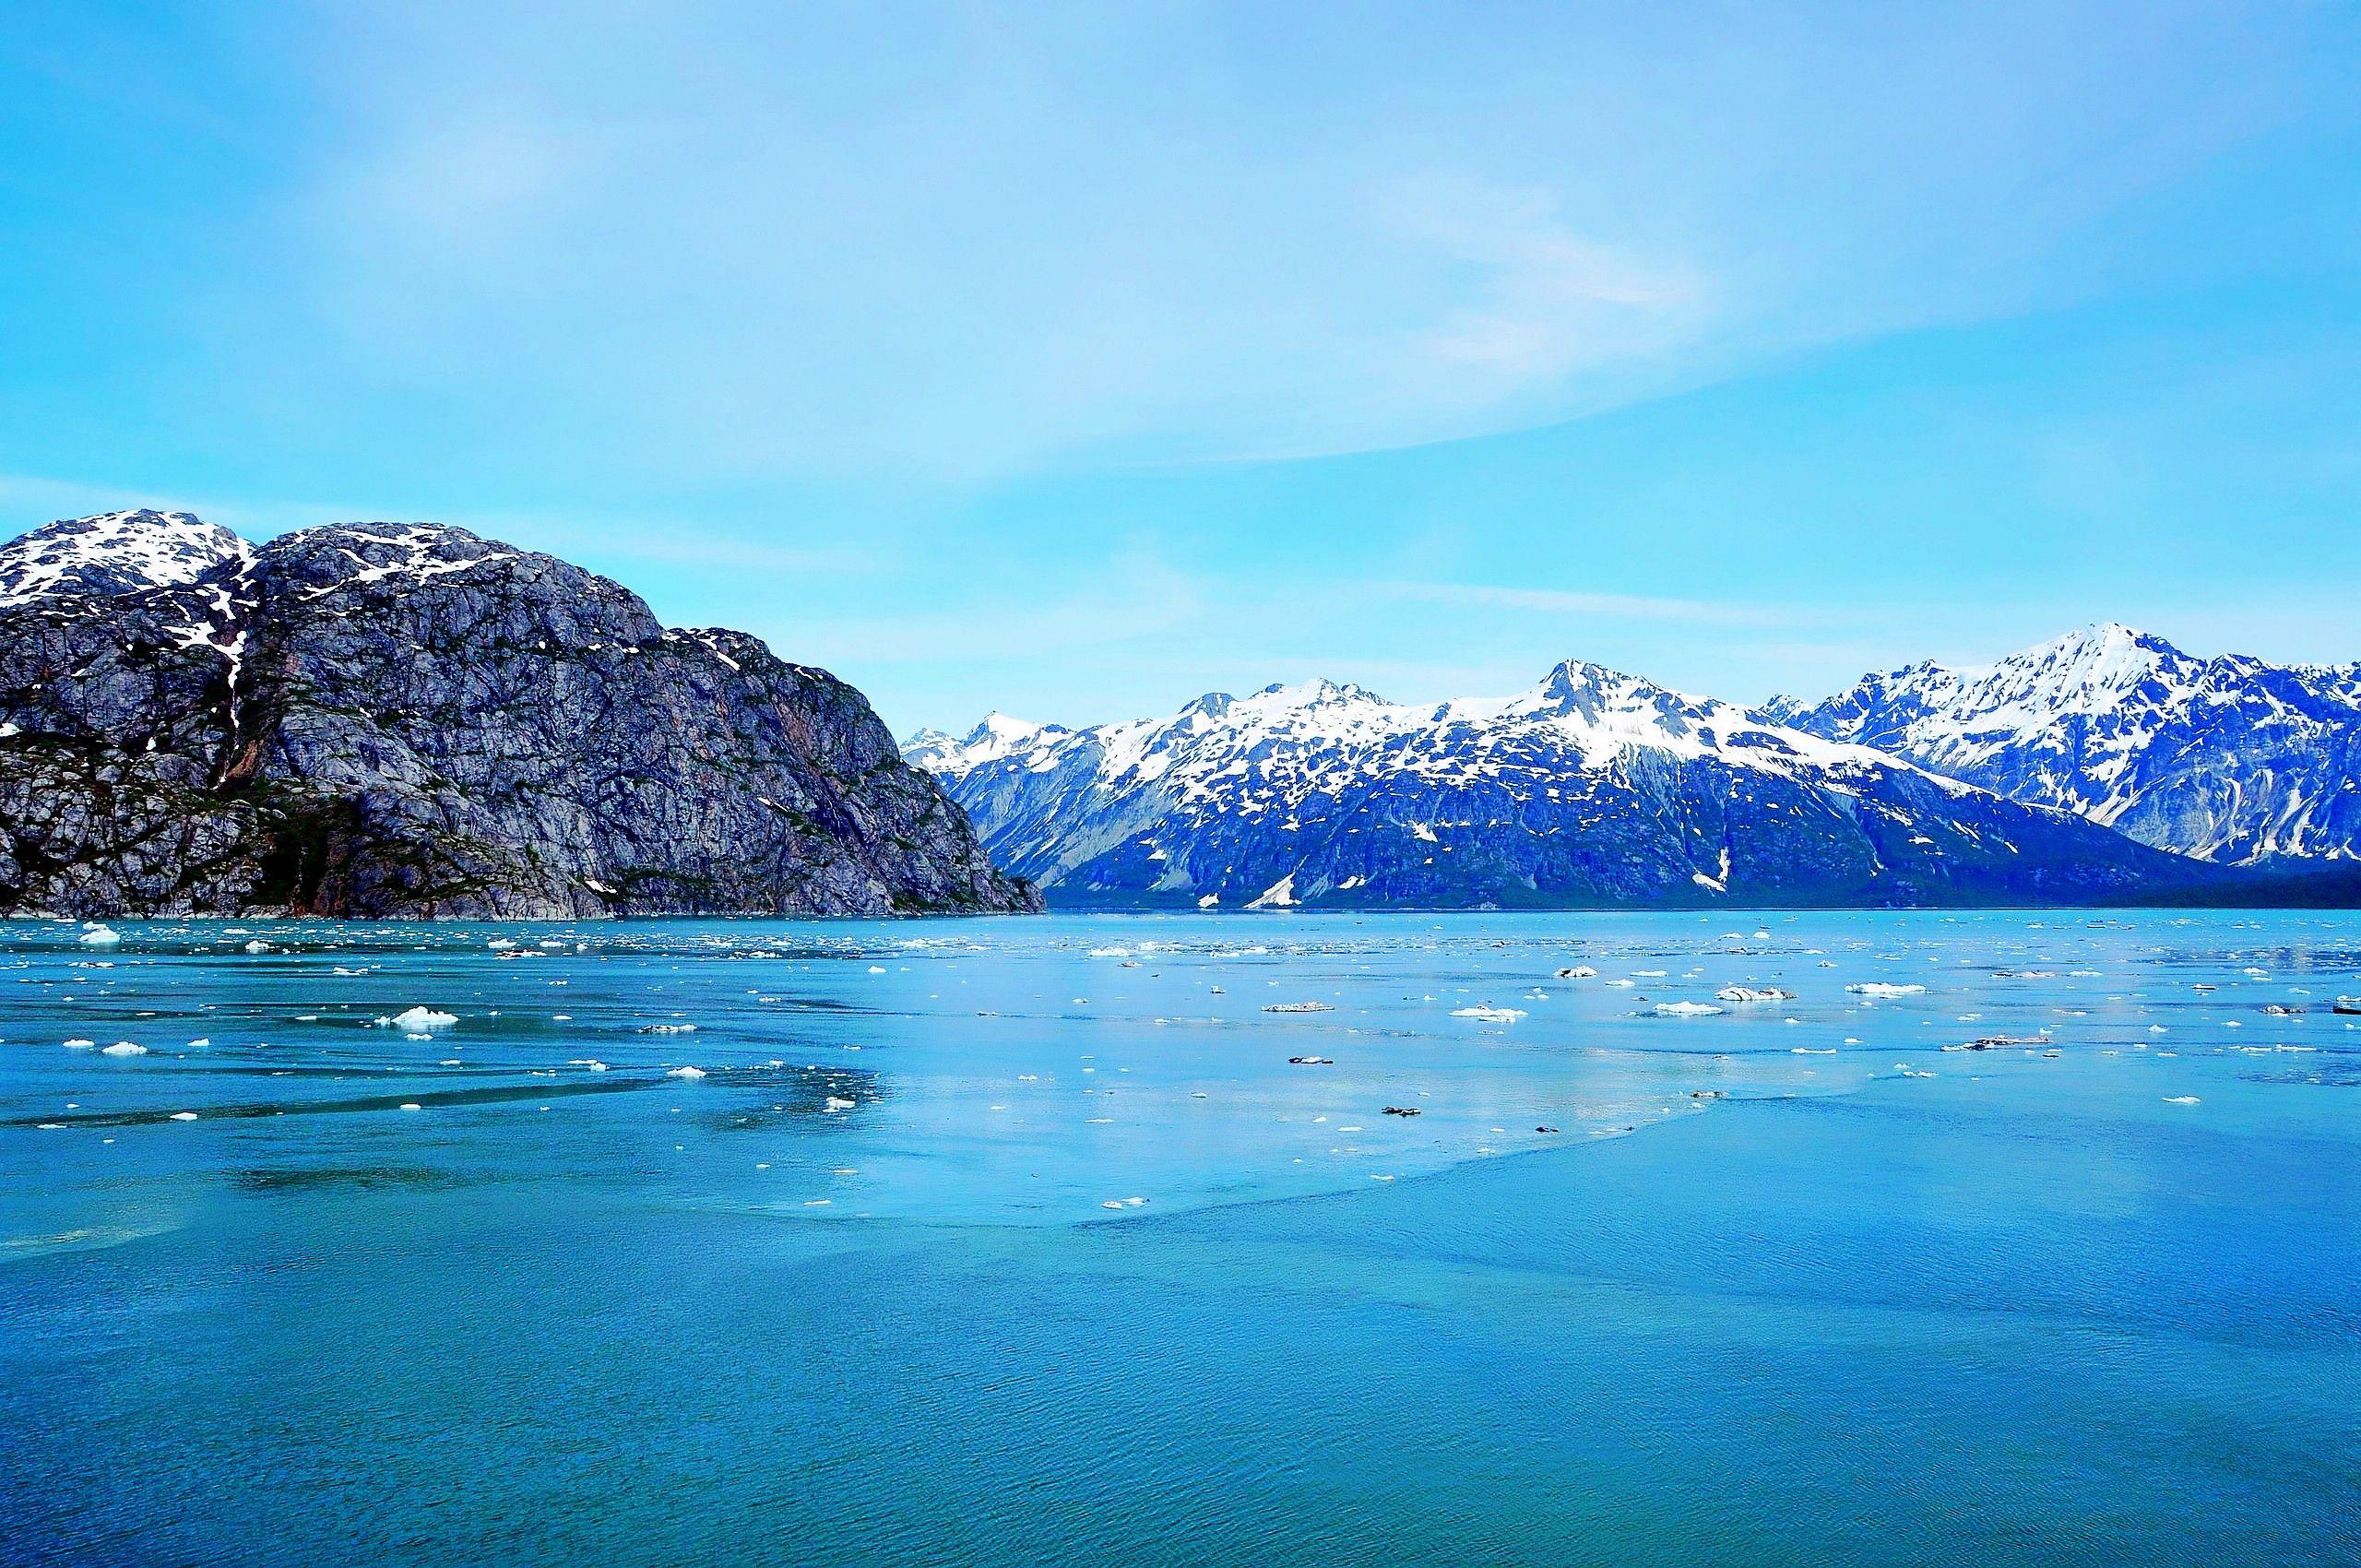 Alaska desktop wallpaper wallpapersafari - Nature background pictures for computer ...